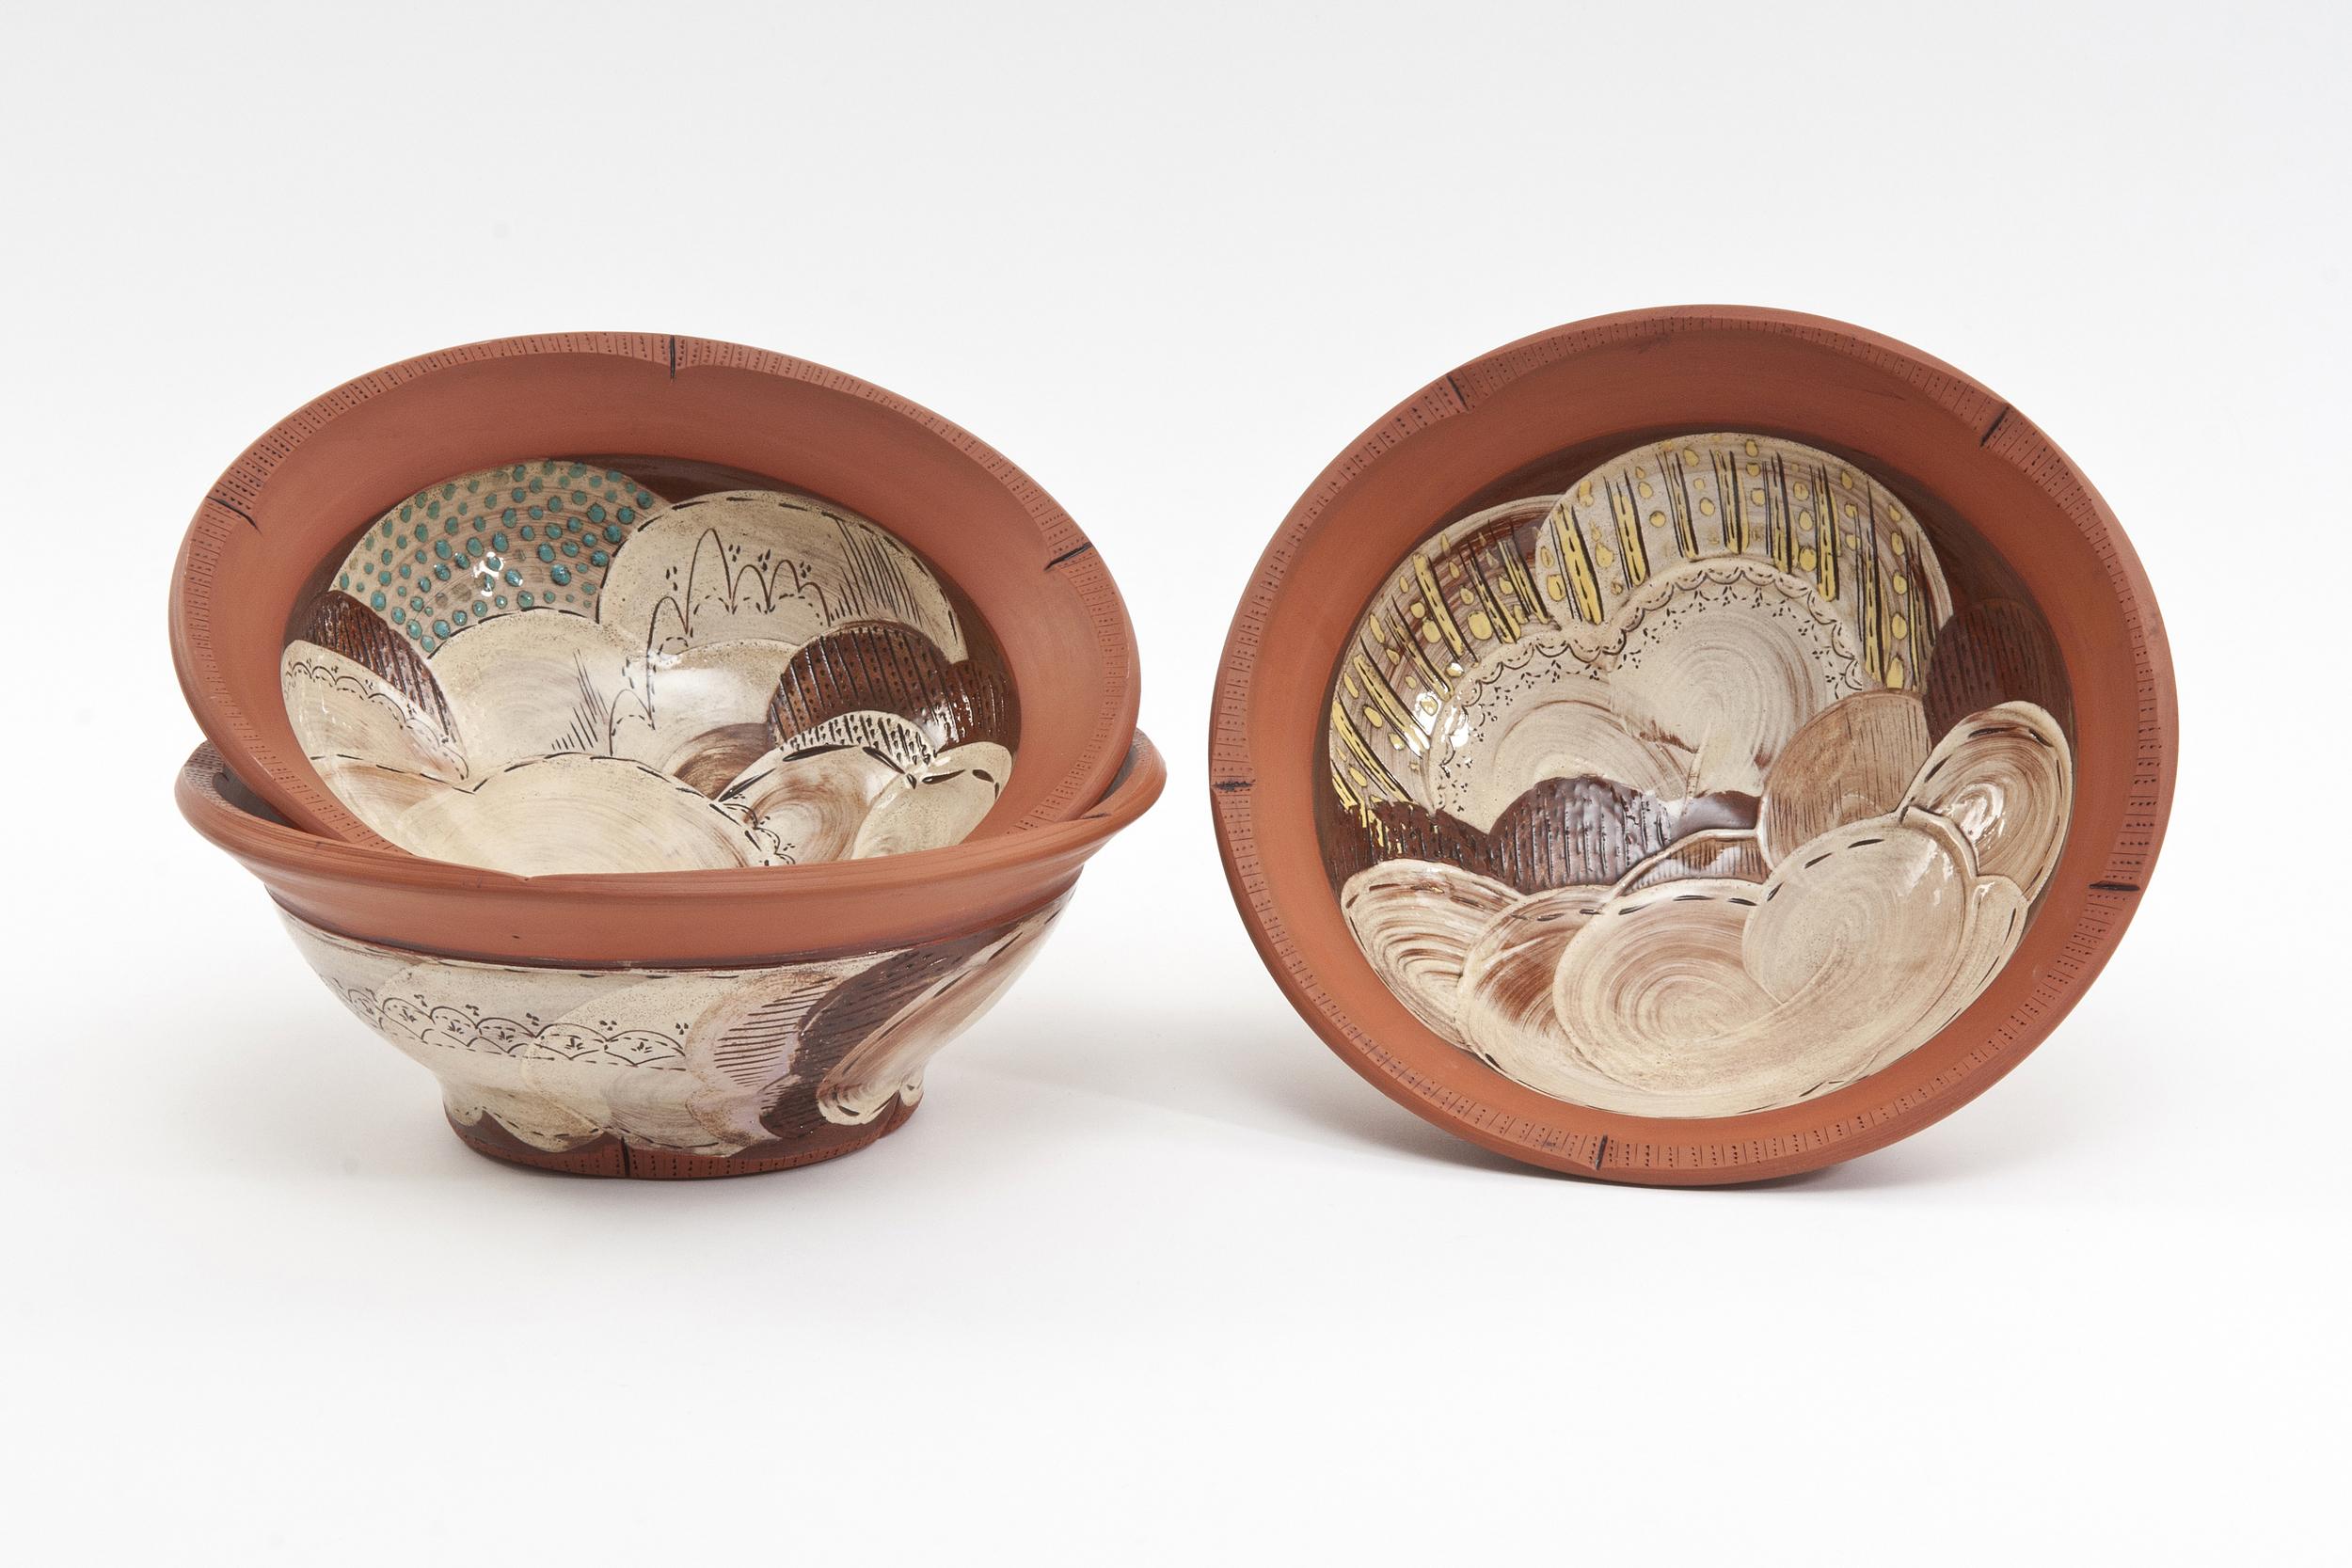 Medium Table Bowls £65